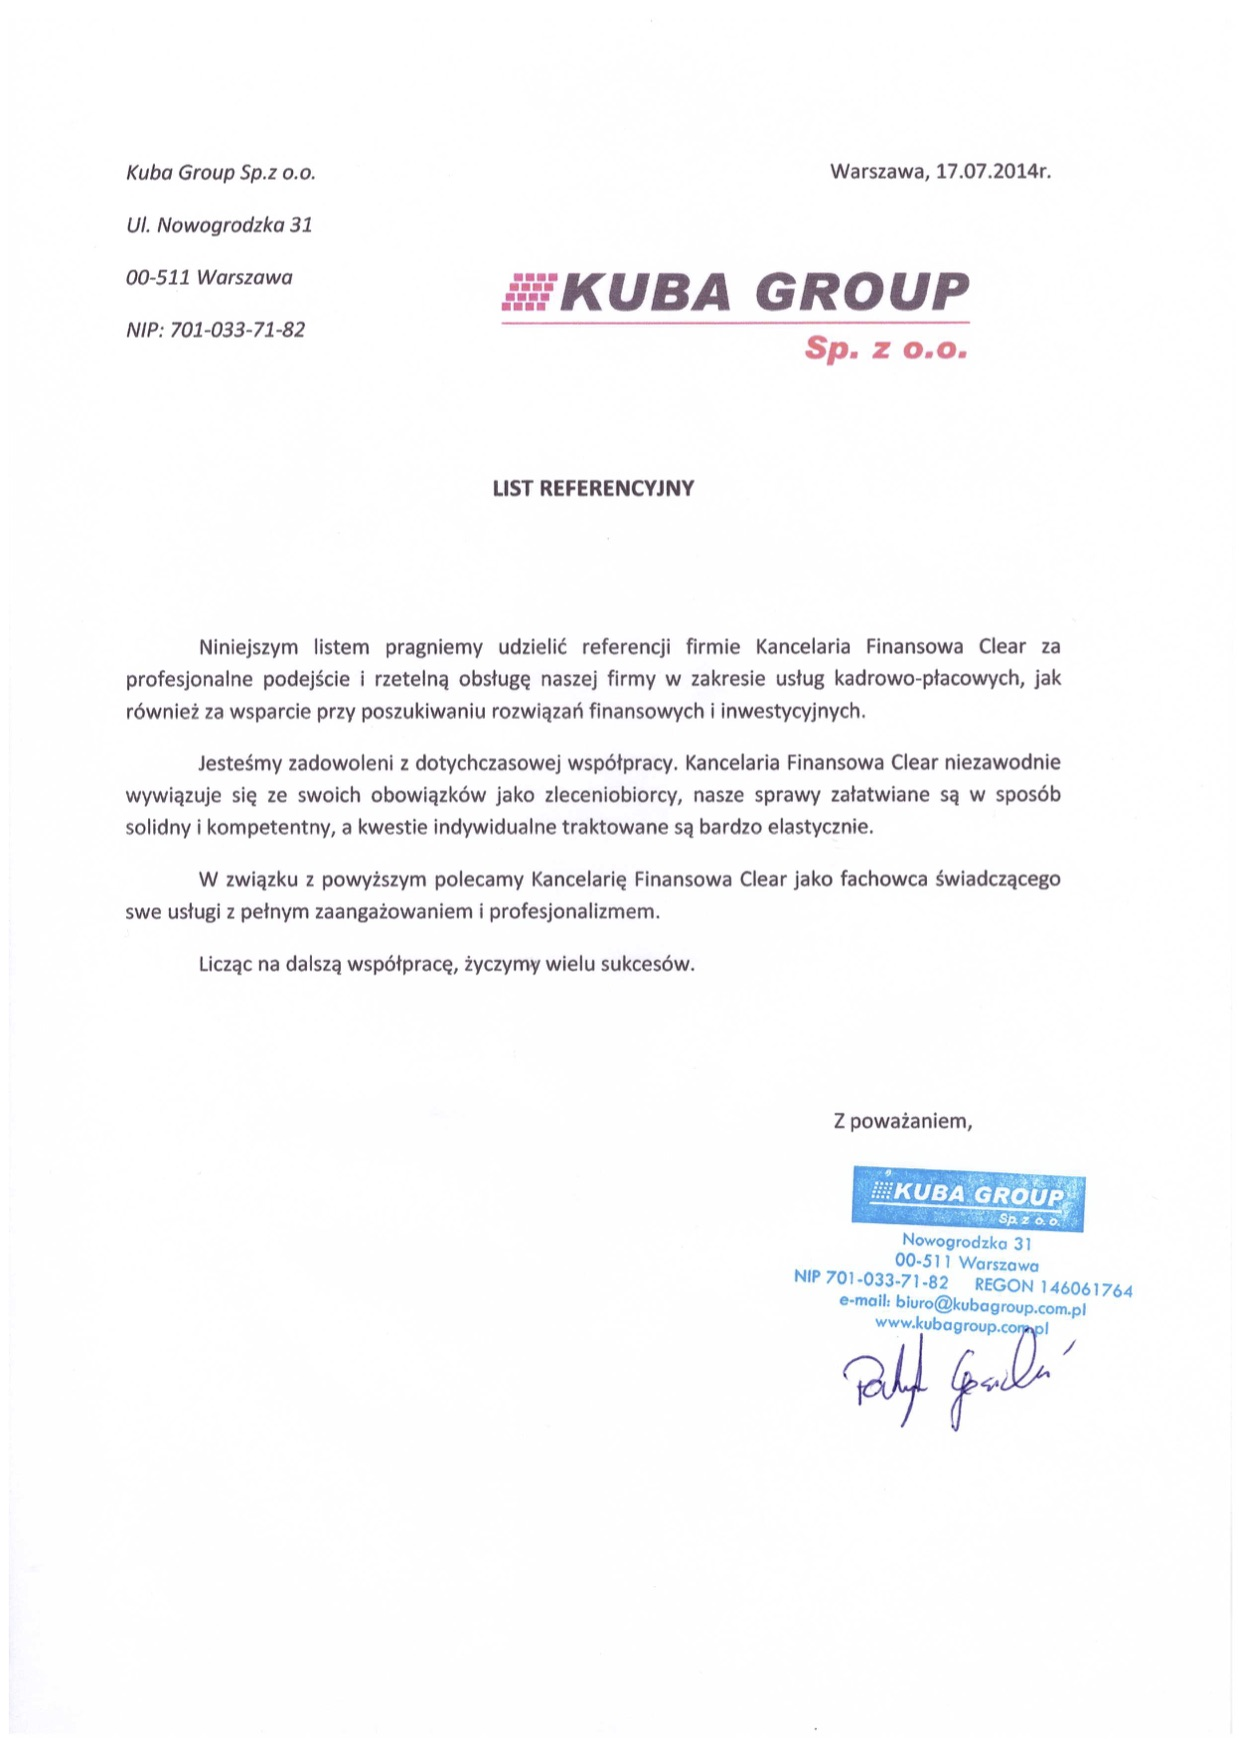 referencje dla kancelaria clear od Kuba Group